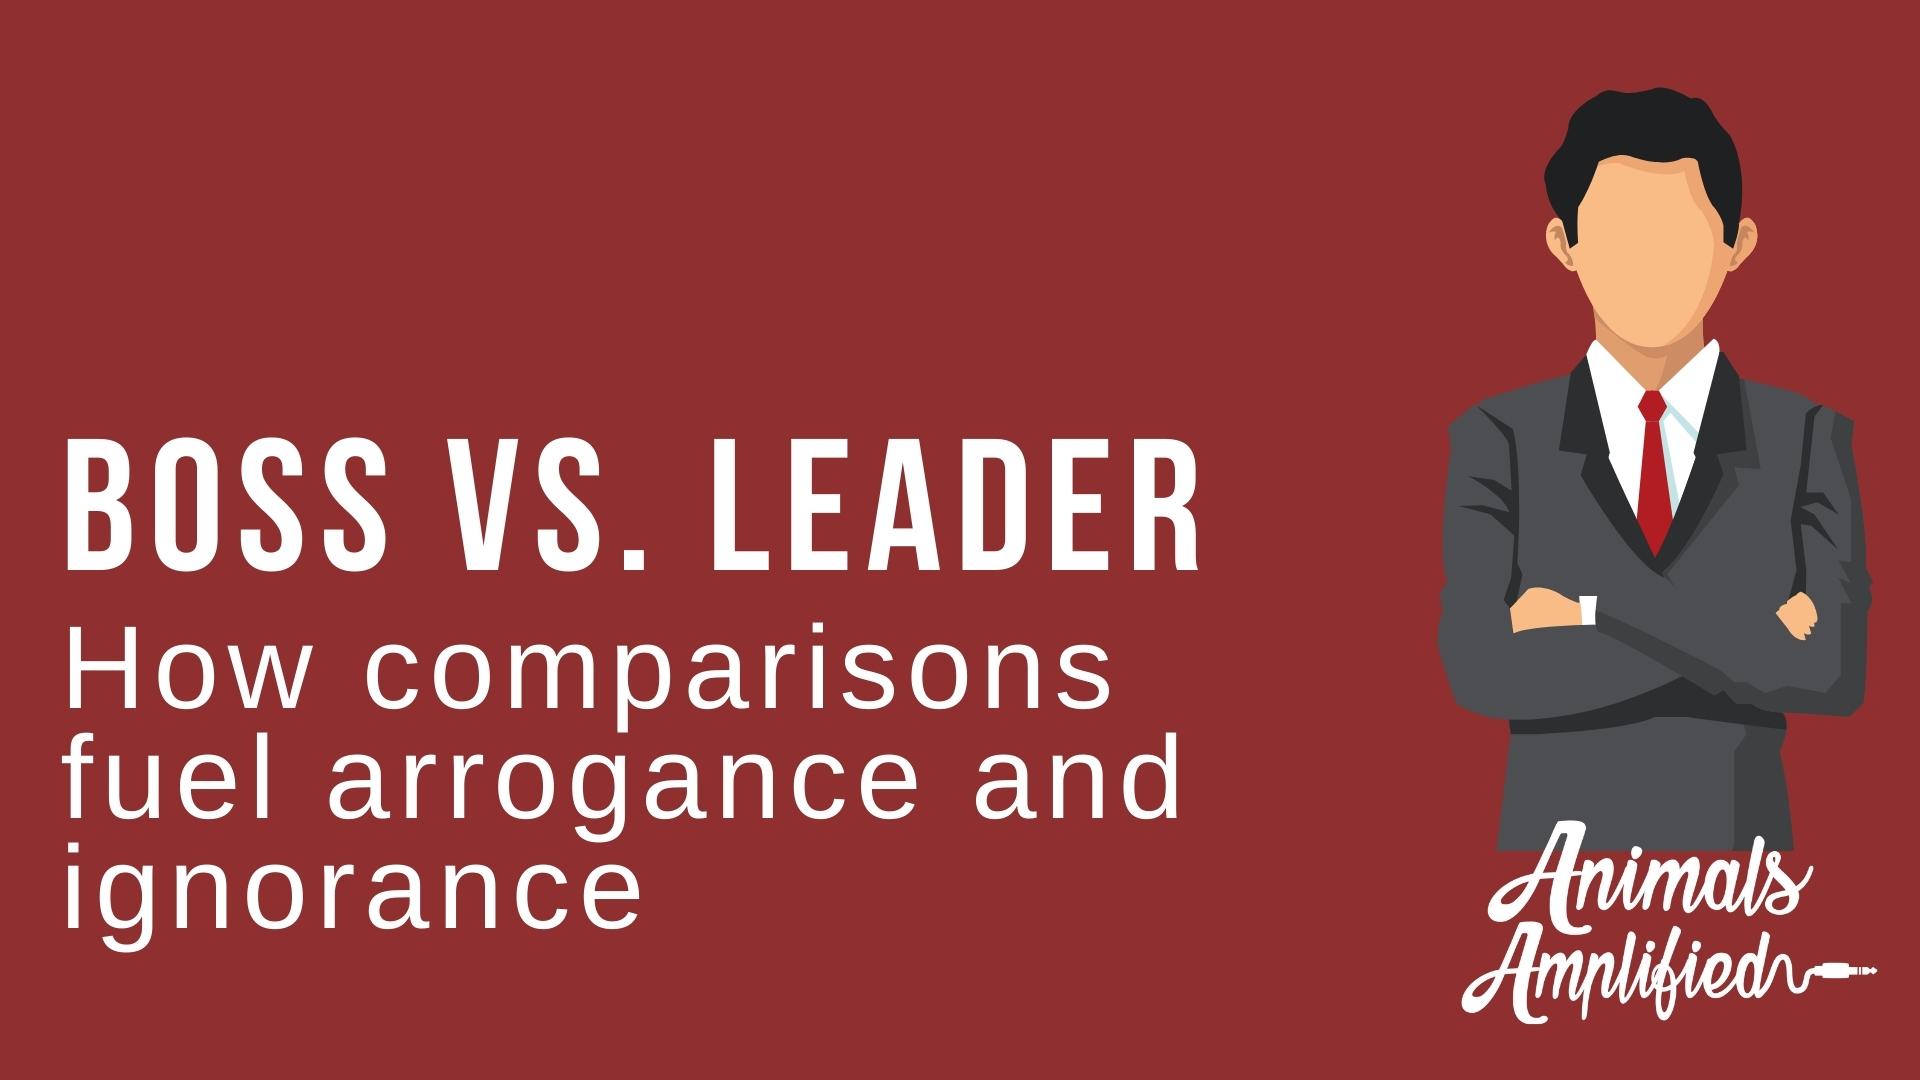 comparisons aren't helpful